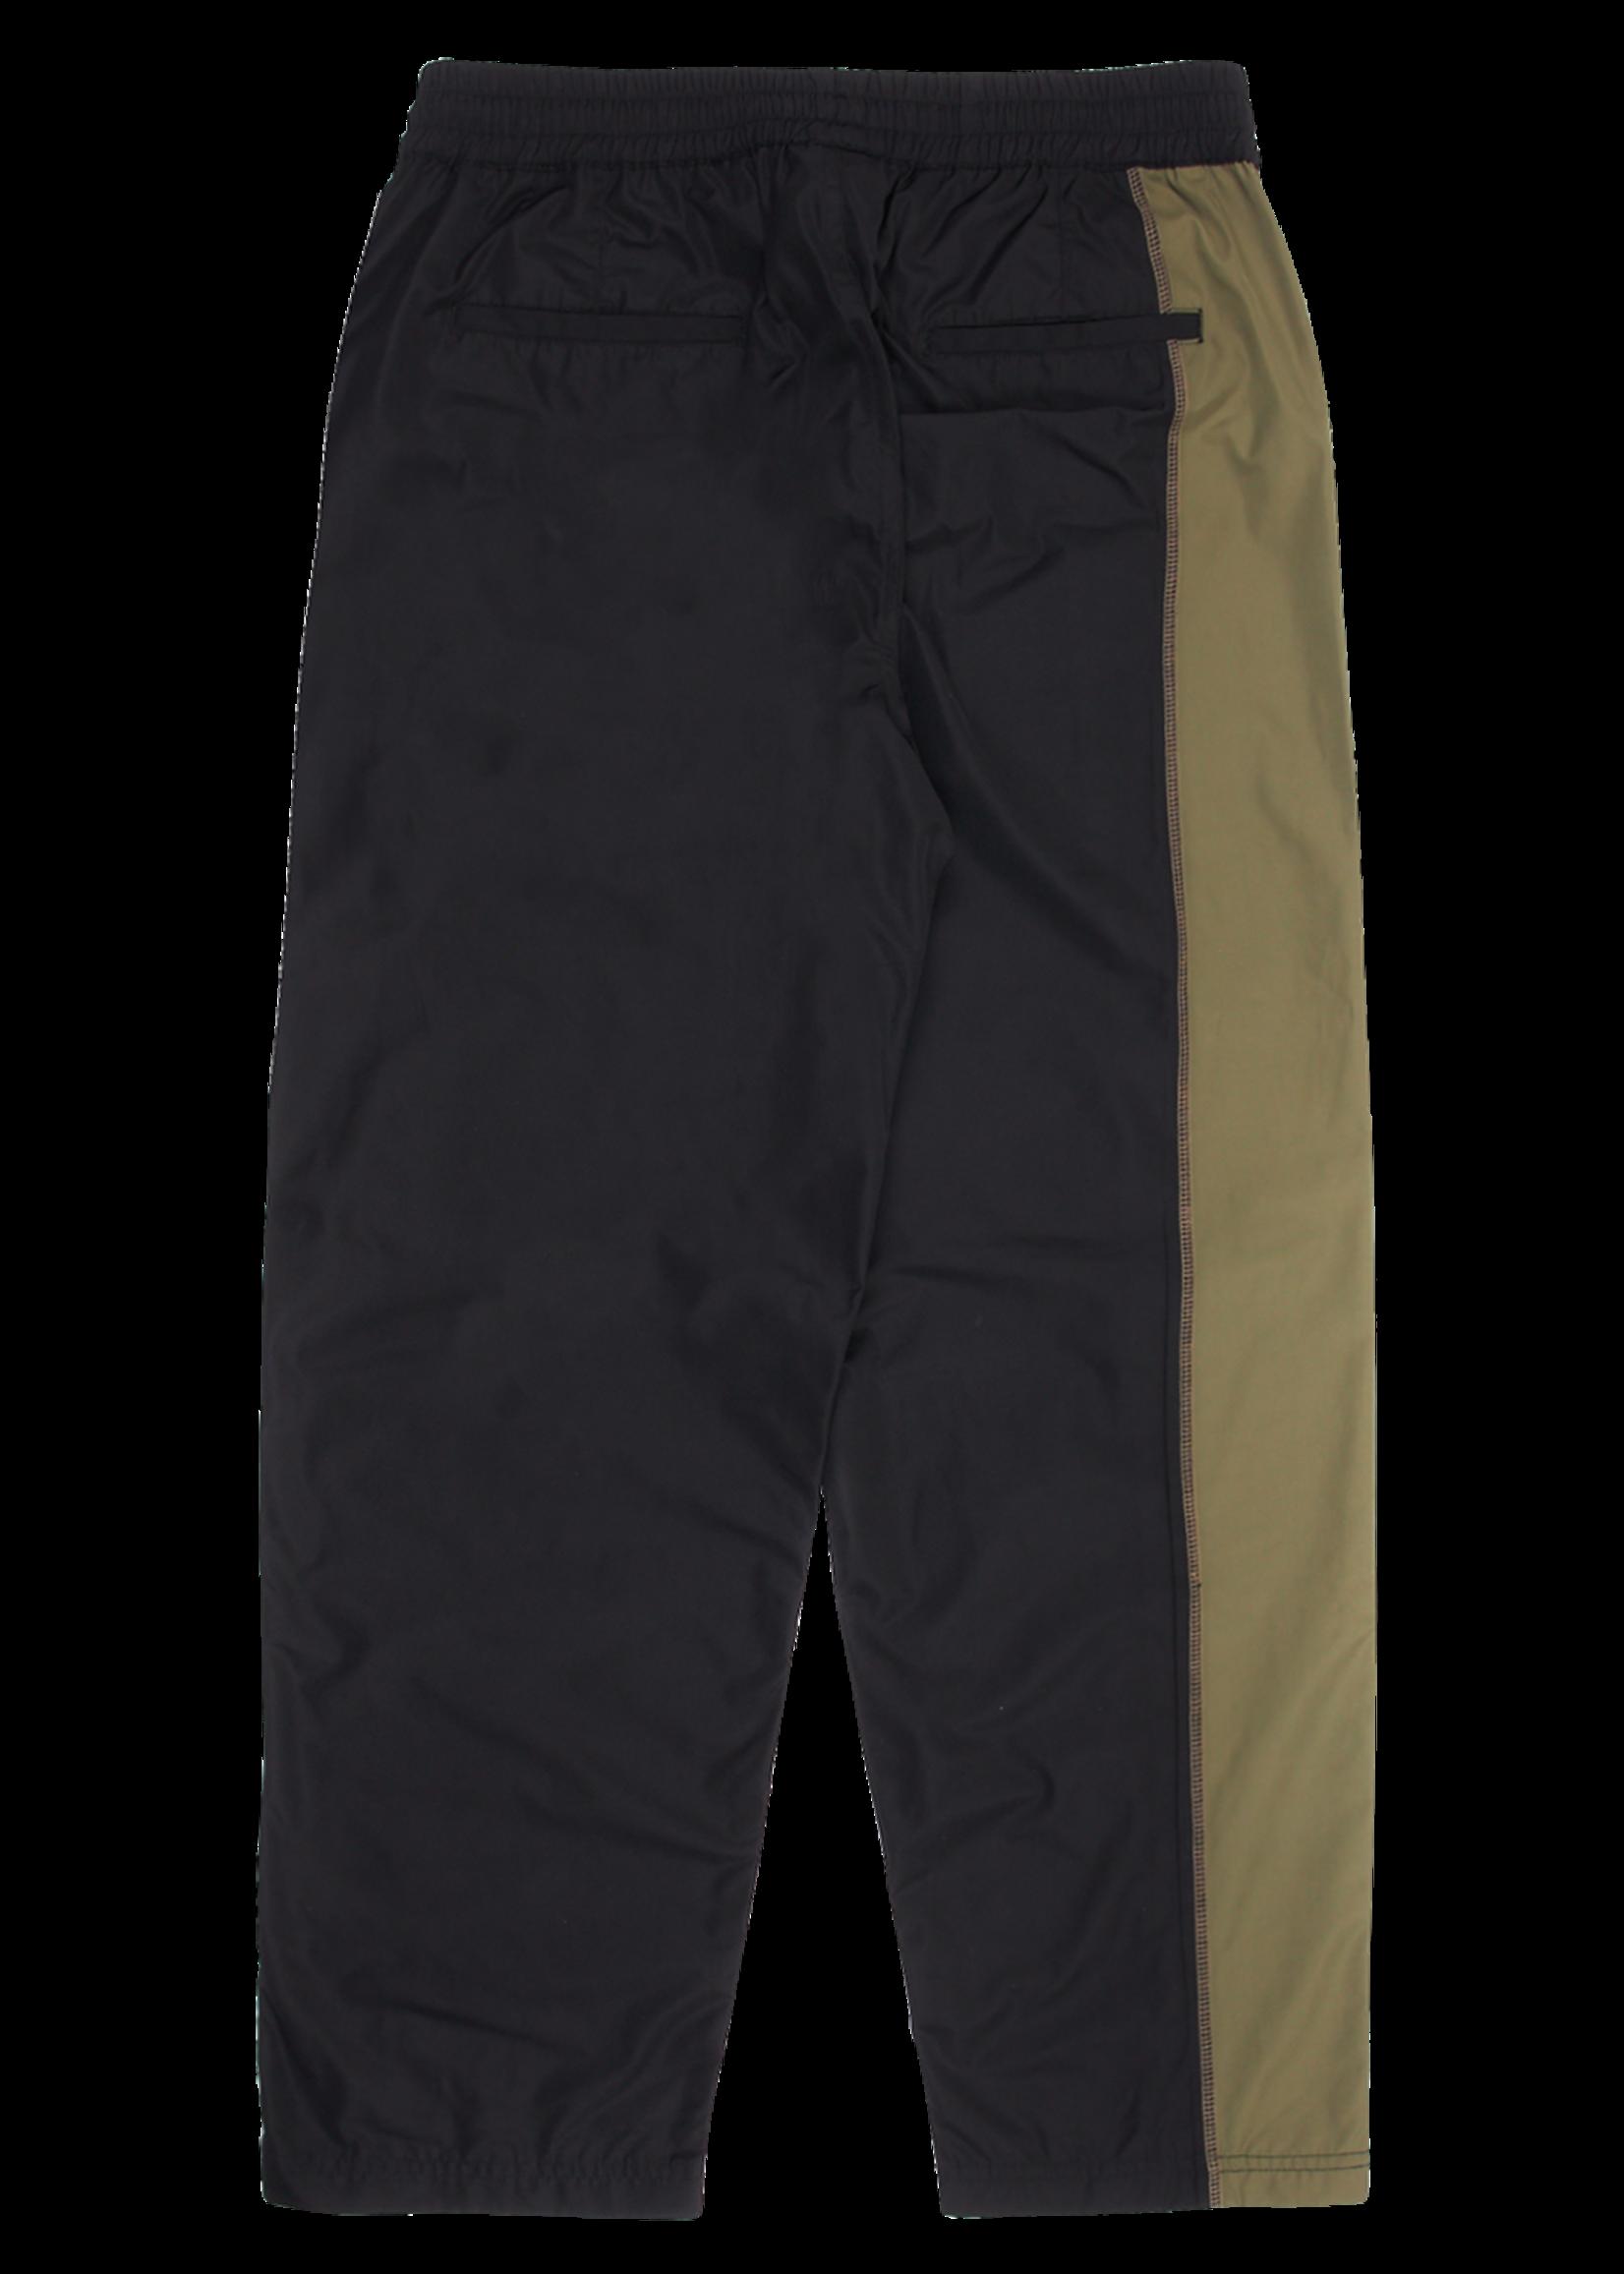 PLEASURES Reality Split Nylon Pant in Black